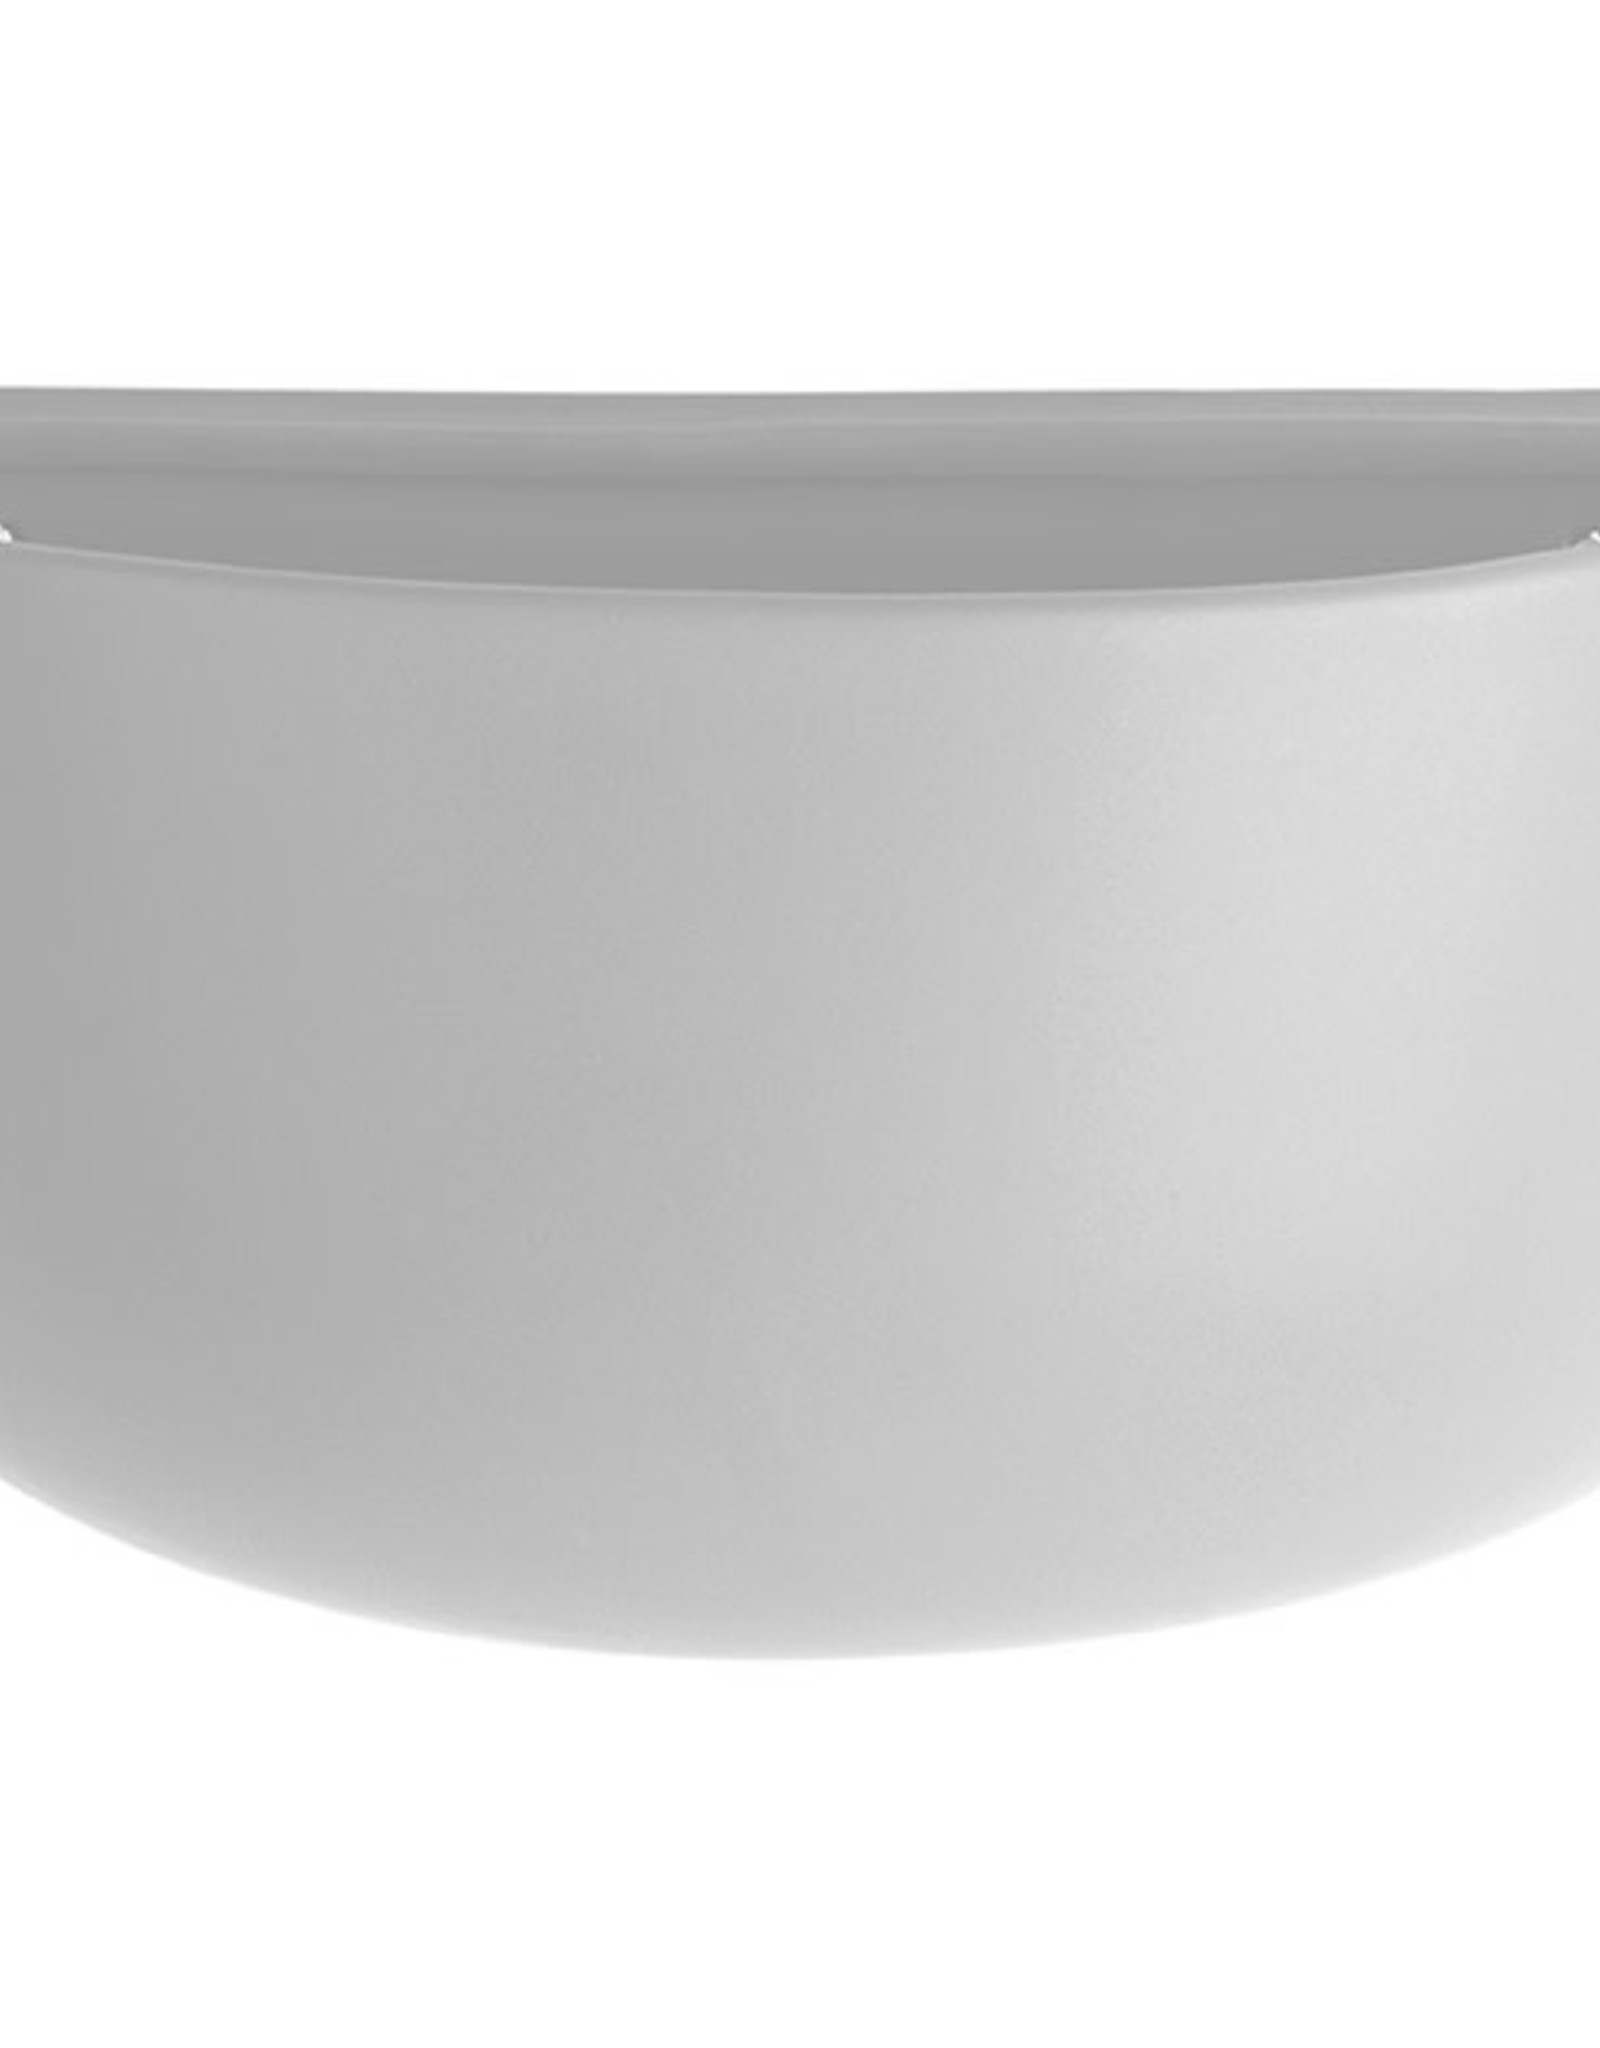 pt Wall Pot Oval Ø7x16 h10.5 cm - White